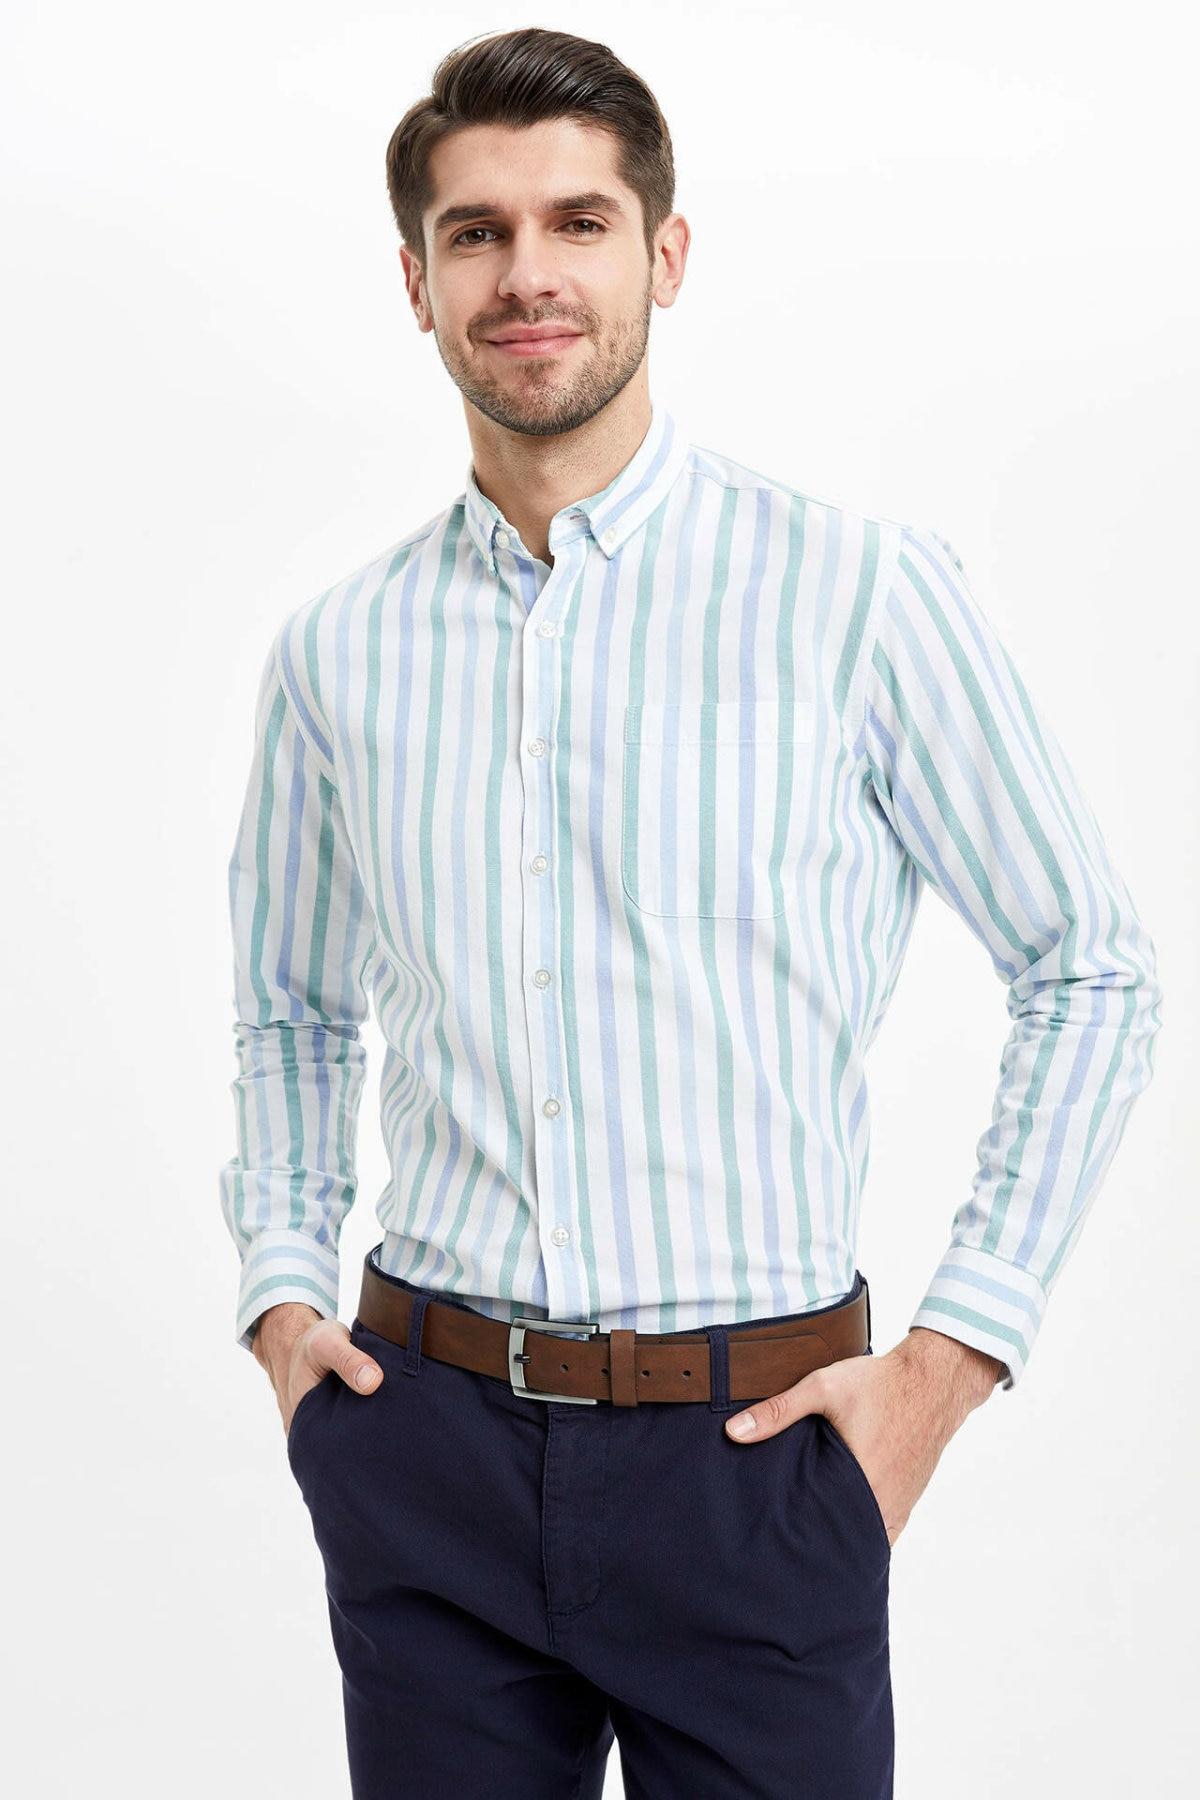 DeFacto Man's Striped Long Sleeve Shirt Men's Spring Casual White Shirts Men's Smart Casual Shirts-M7508AZ20SP